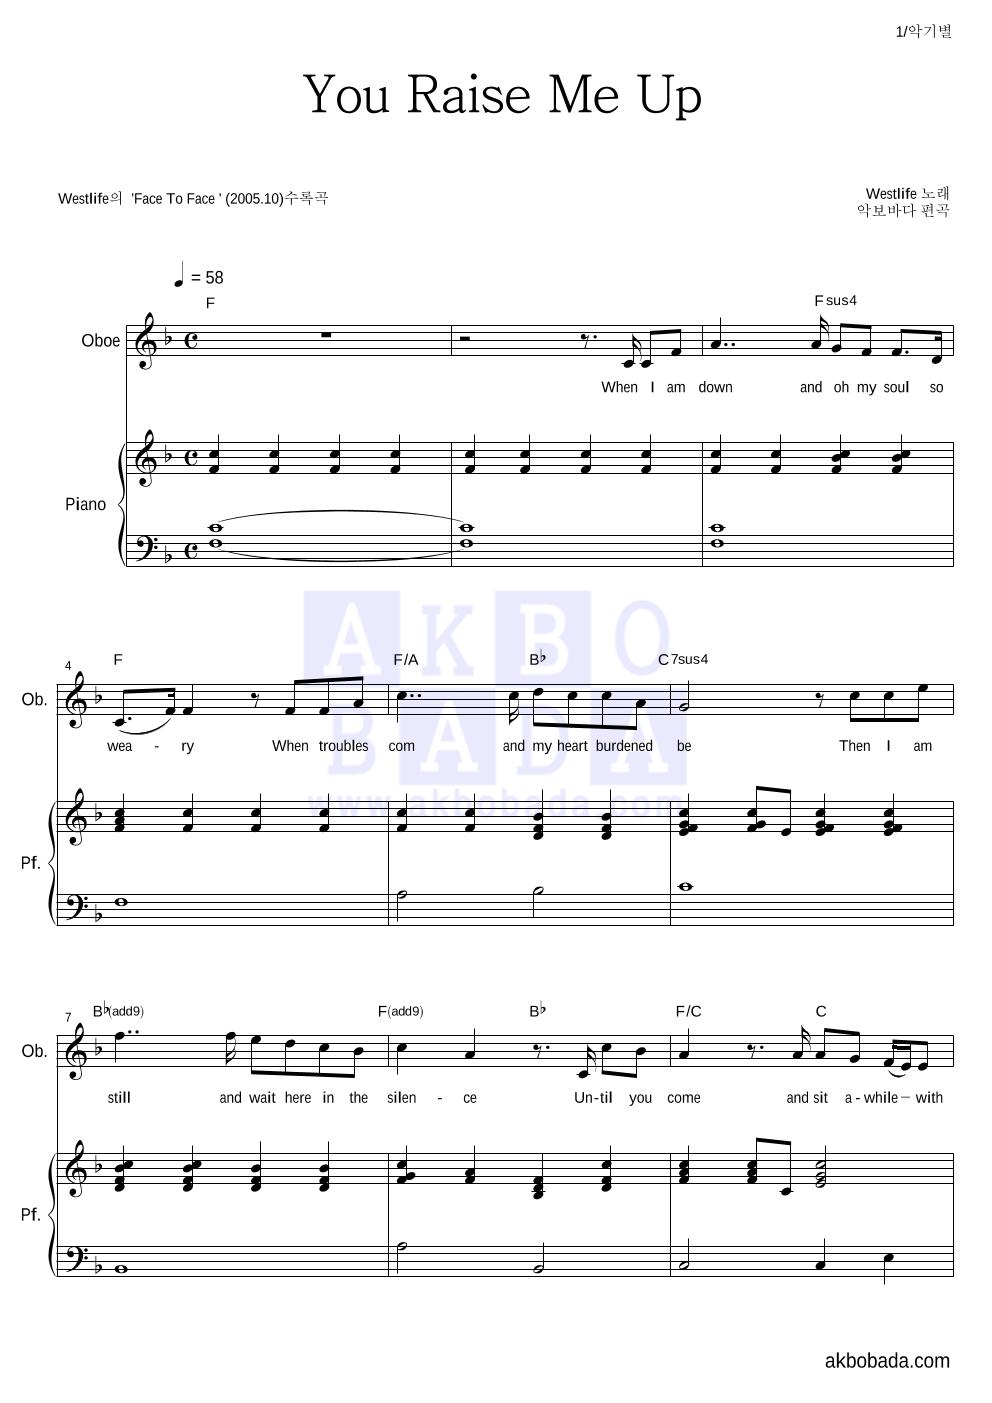 Westlife - You Raise Me Up 오보에&피아노 악보